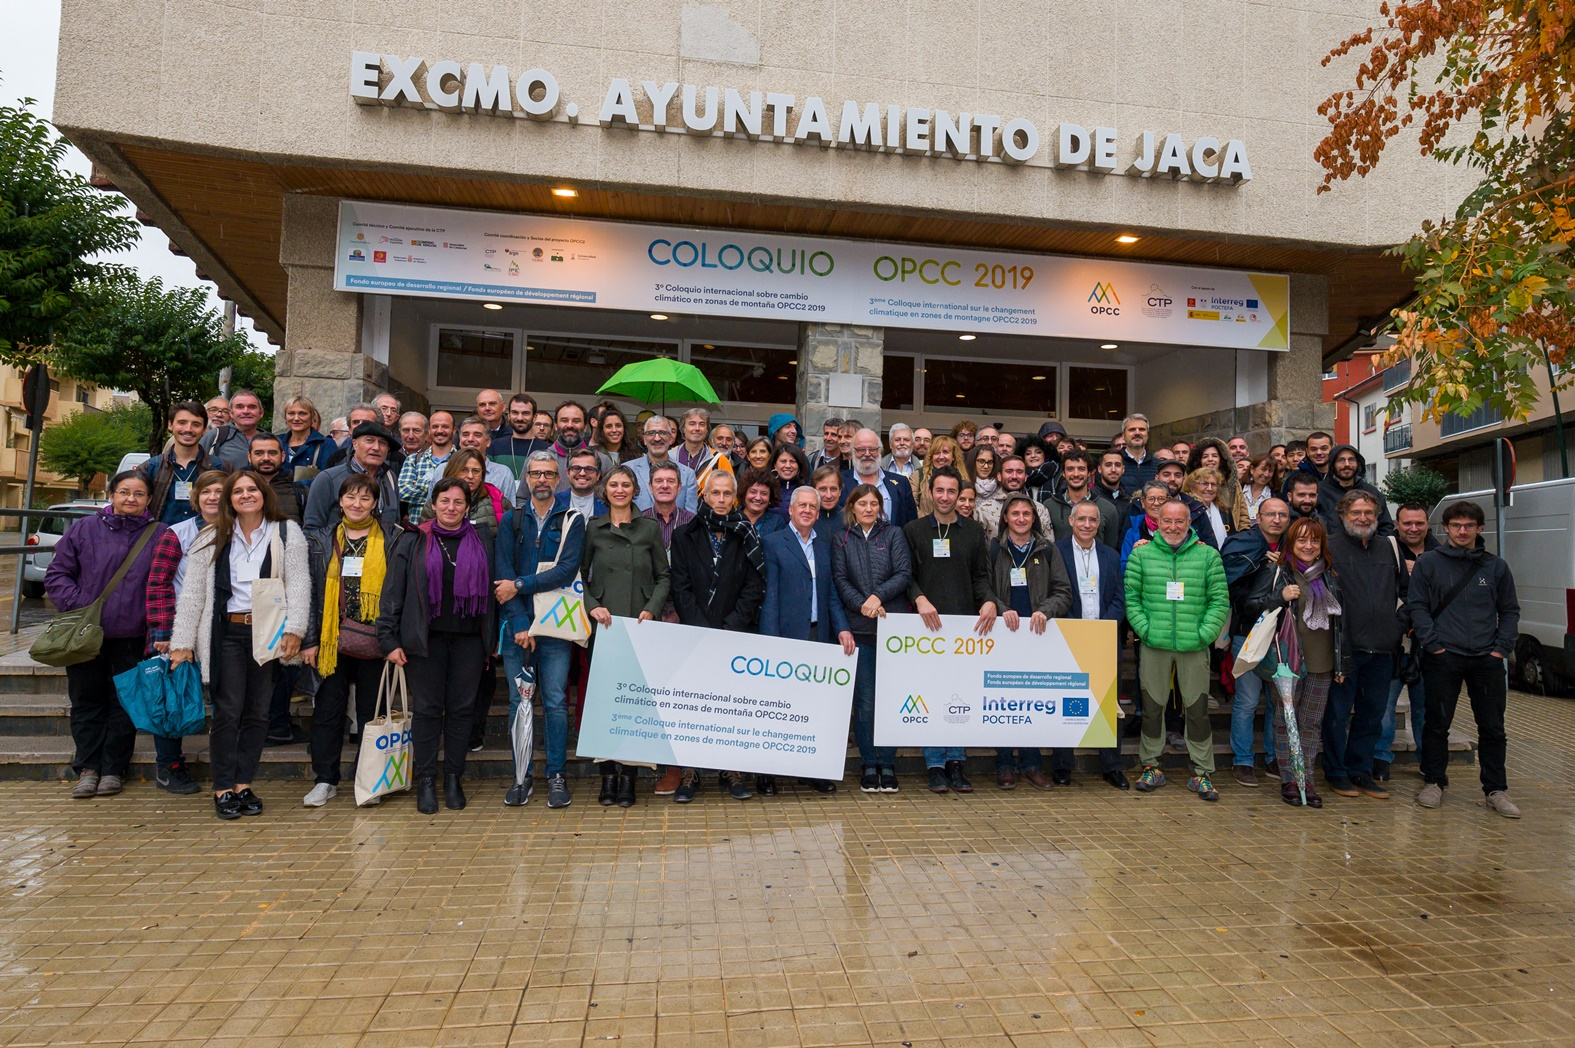 Foto familia Coloquio OPCC Jaca 2 @IvánEscribano